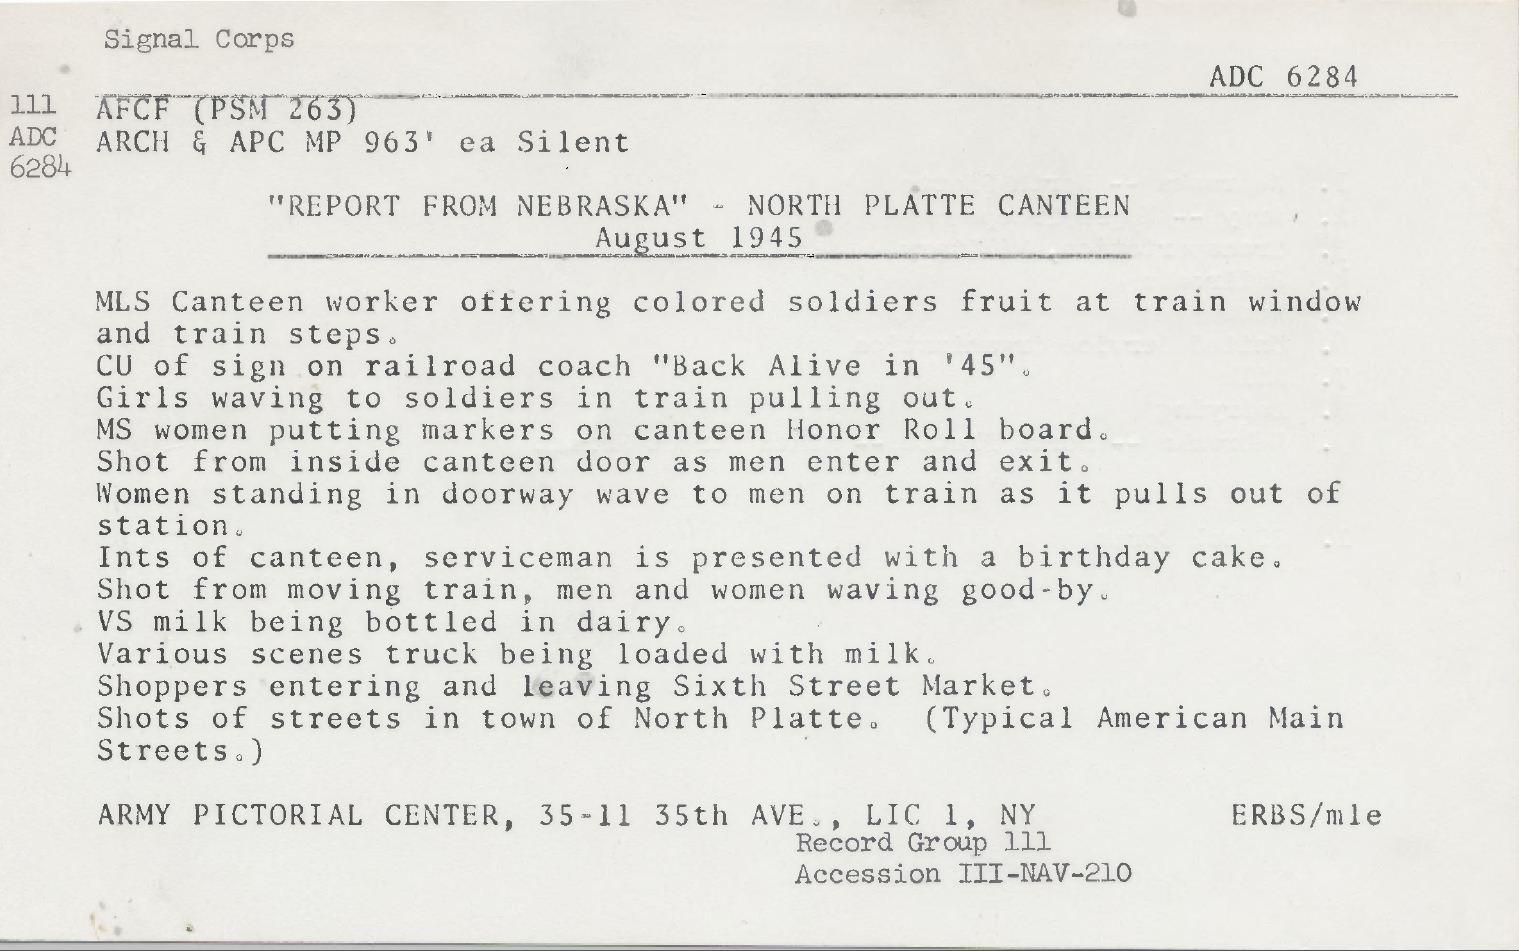 111-adc-6284-notecard